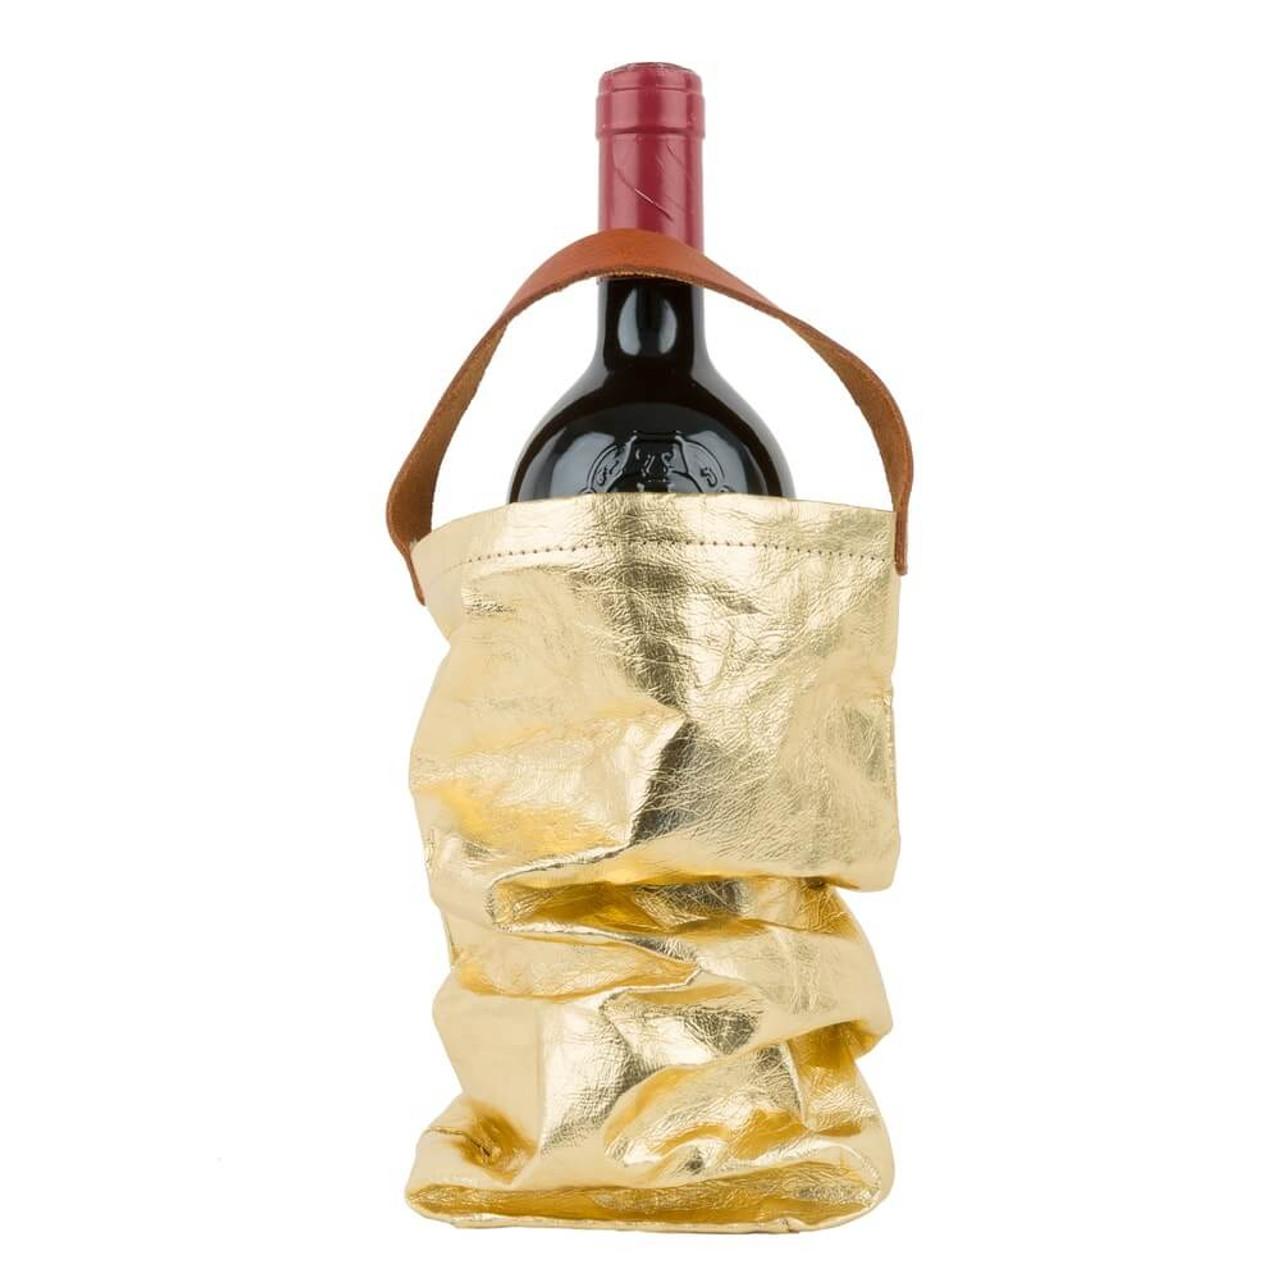 UASHMAMA wine bag organic paper bags gold metallo